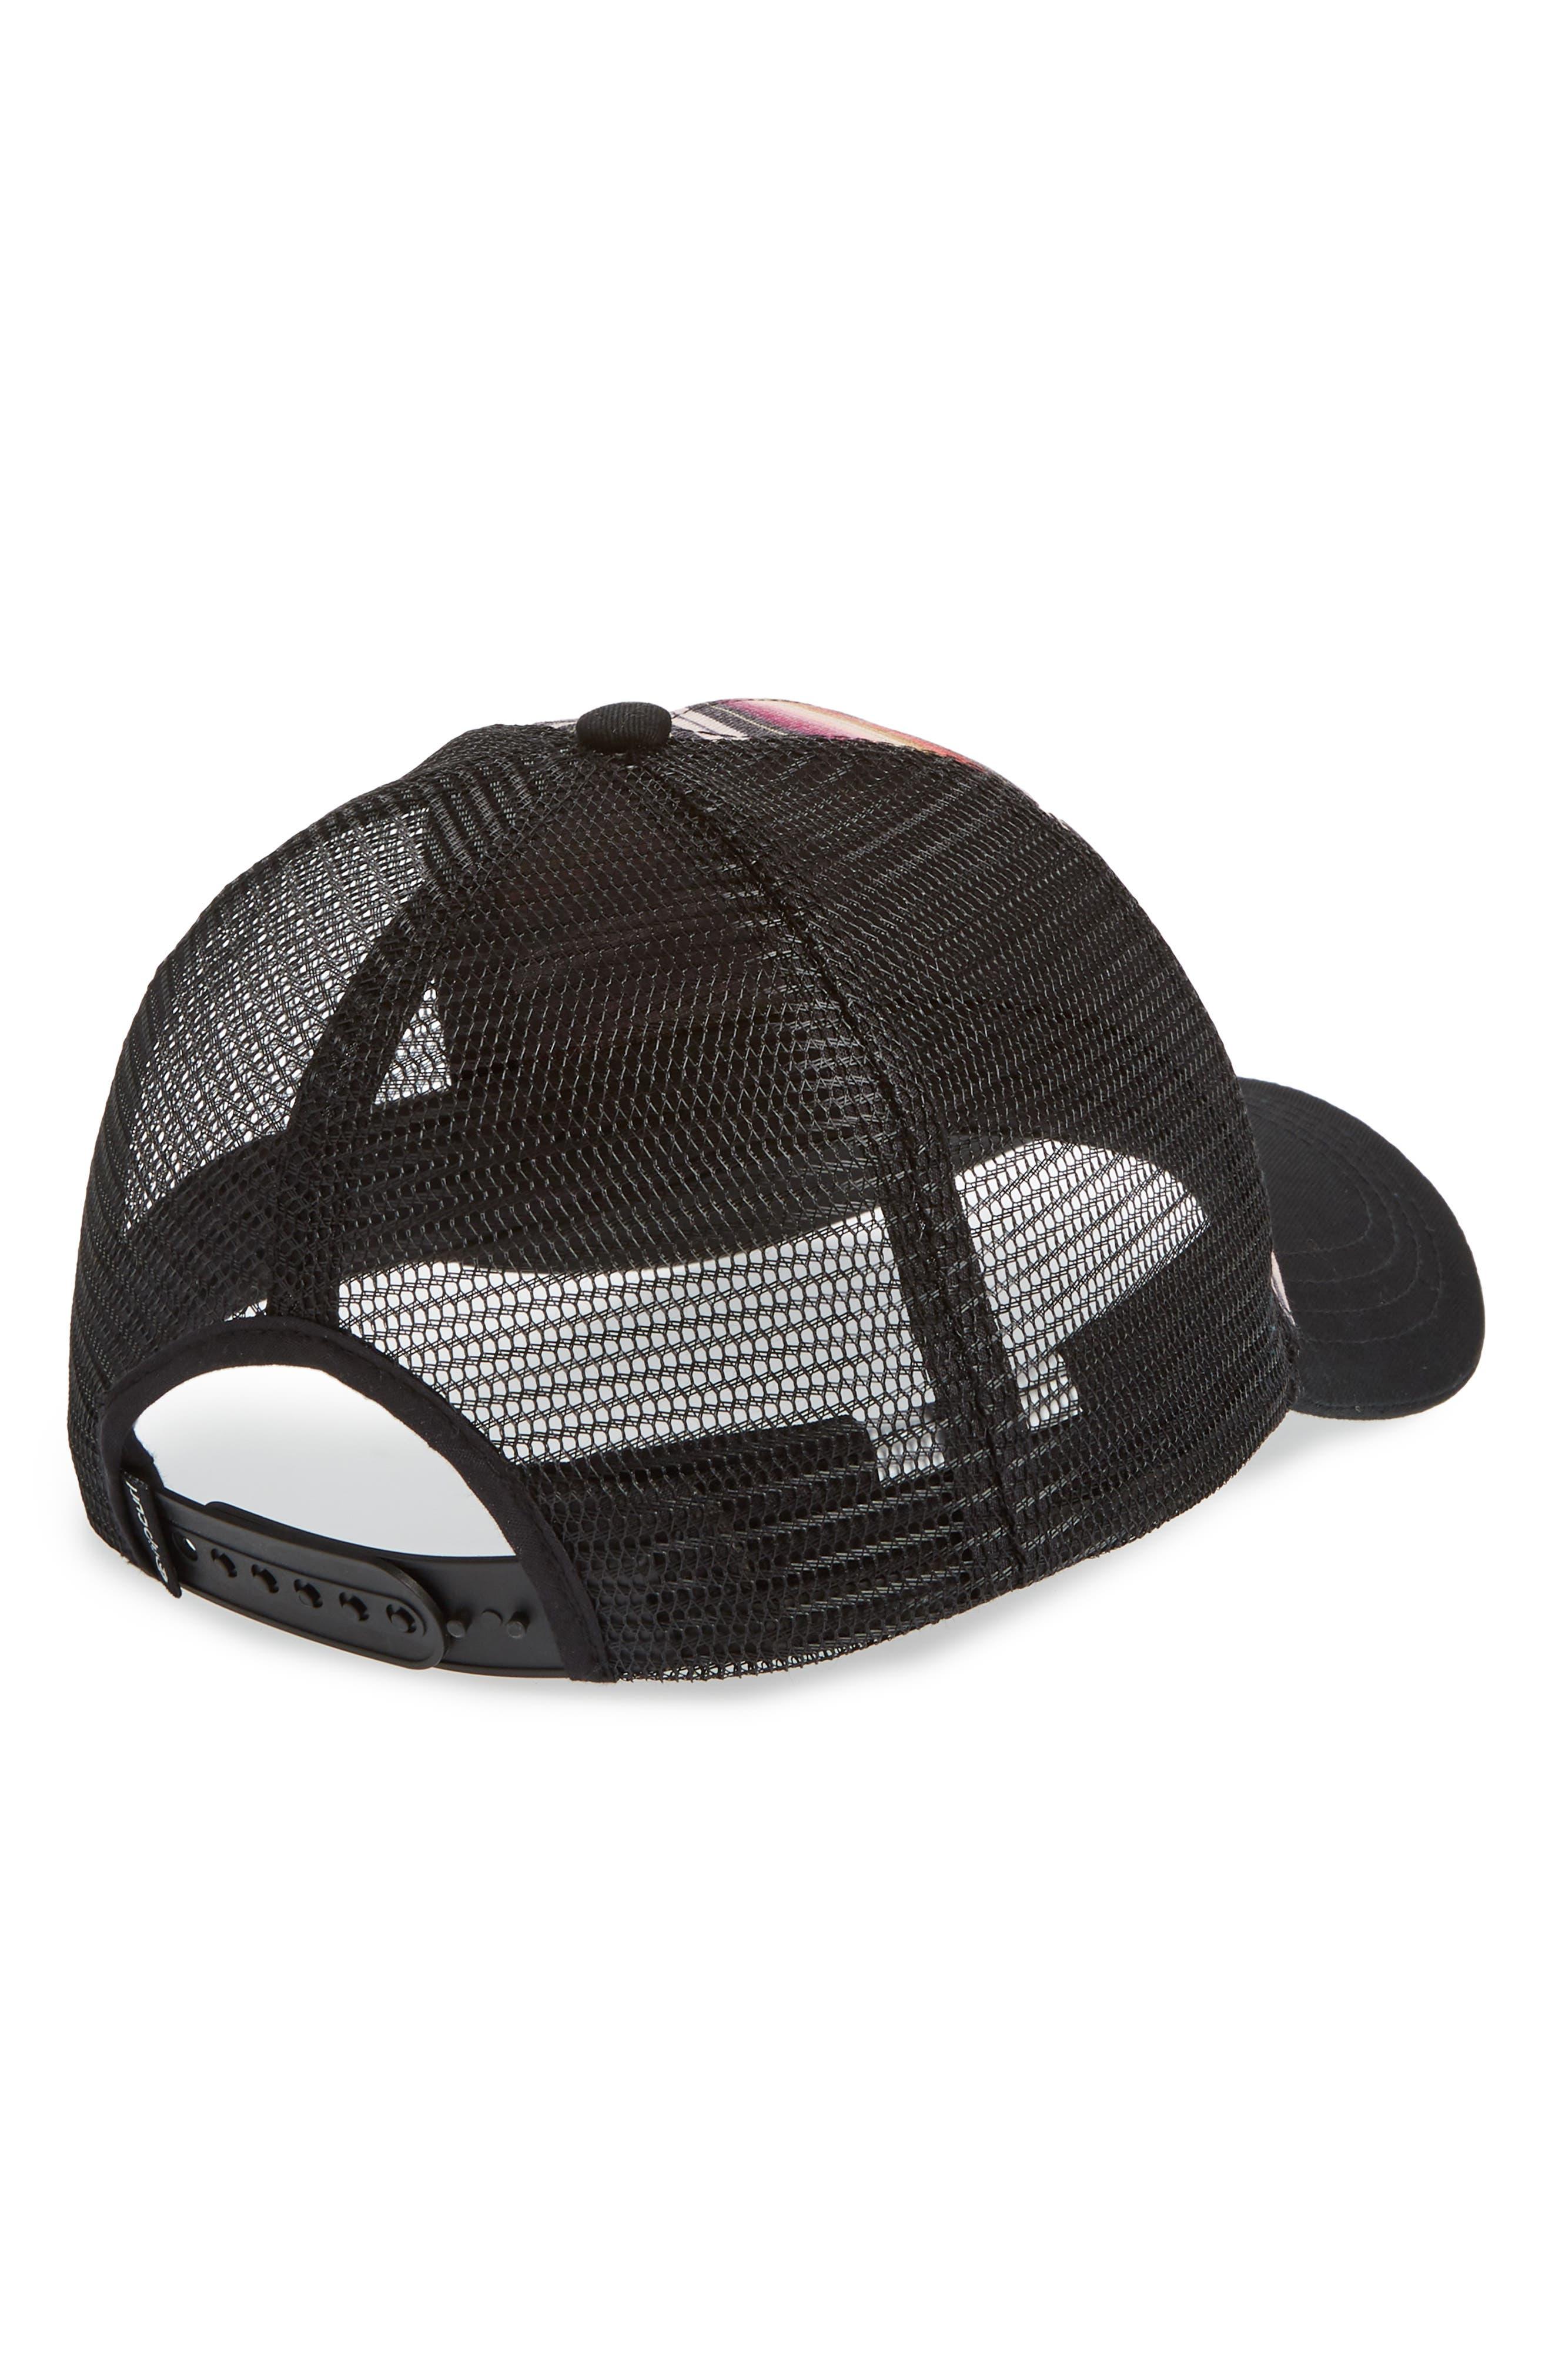 Sayulita Trucker Hat,                             Alternate thumbnail 2, color,                             Black